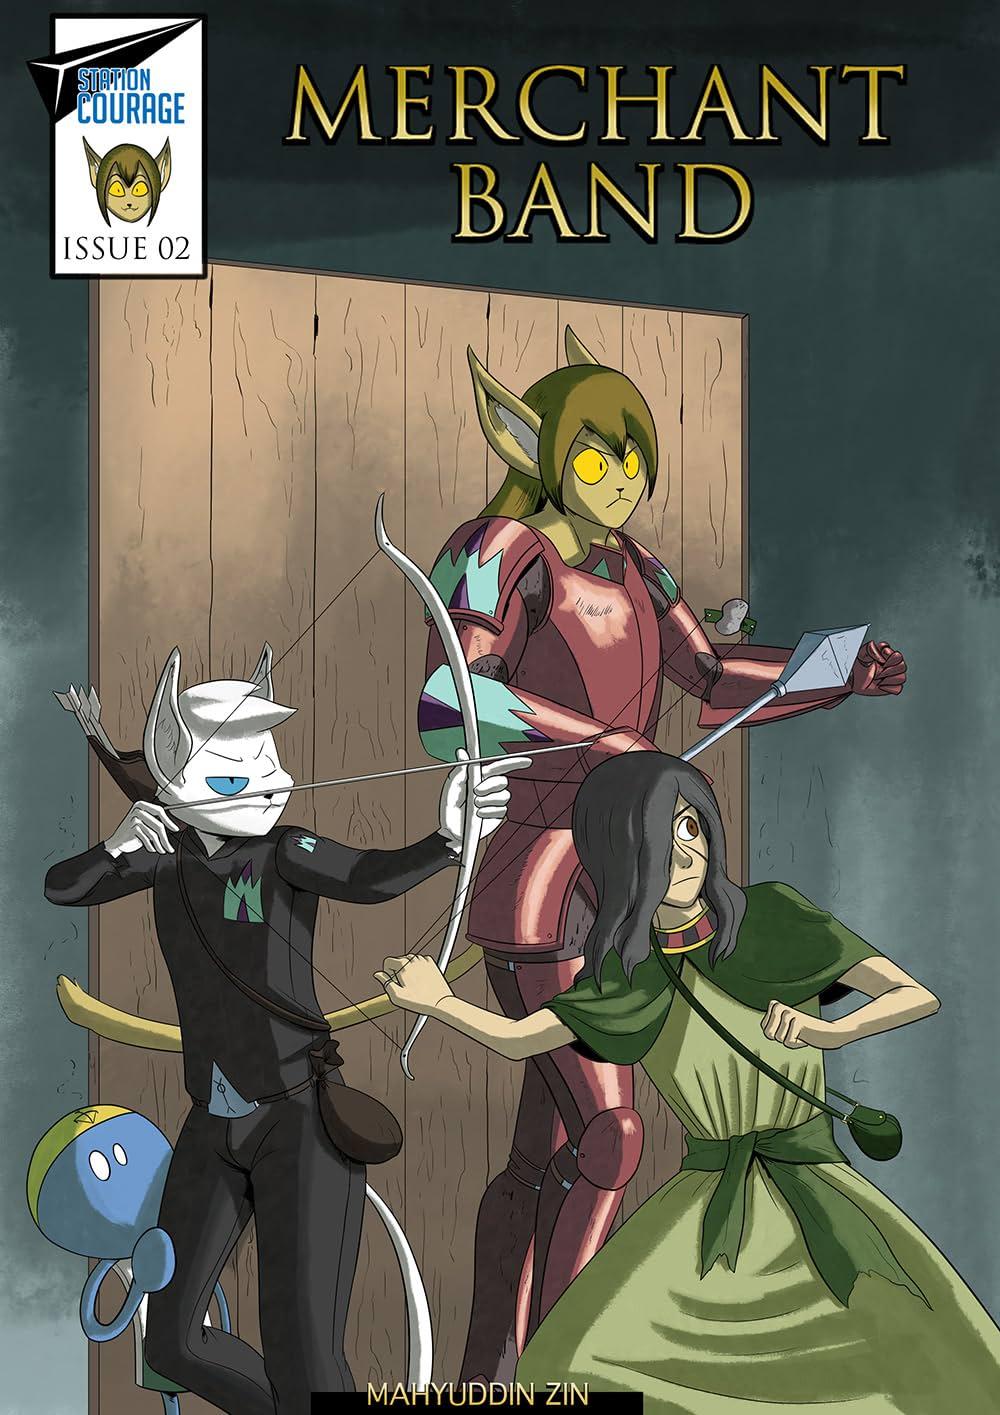 Merchant Band #2